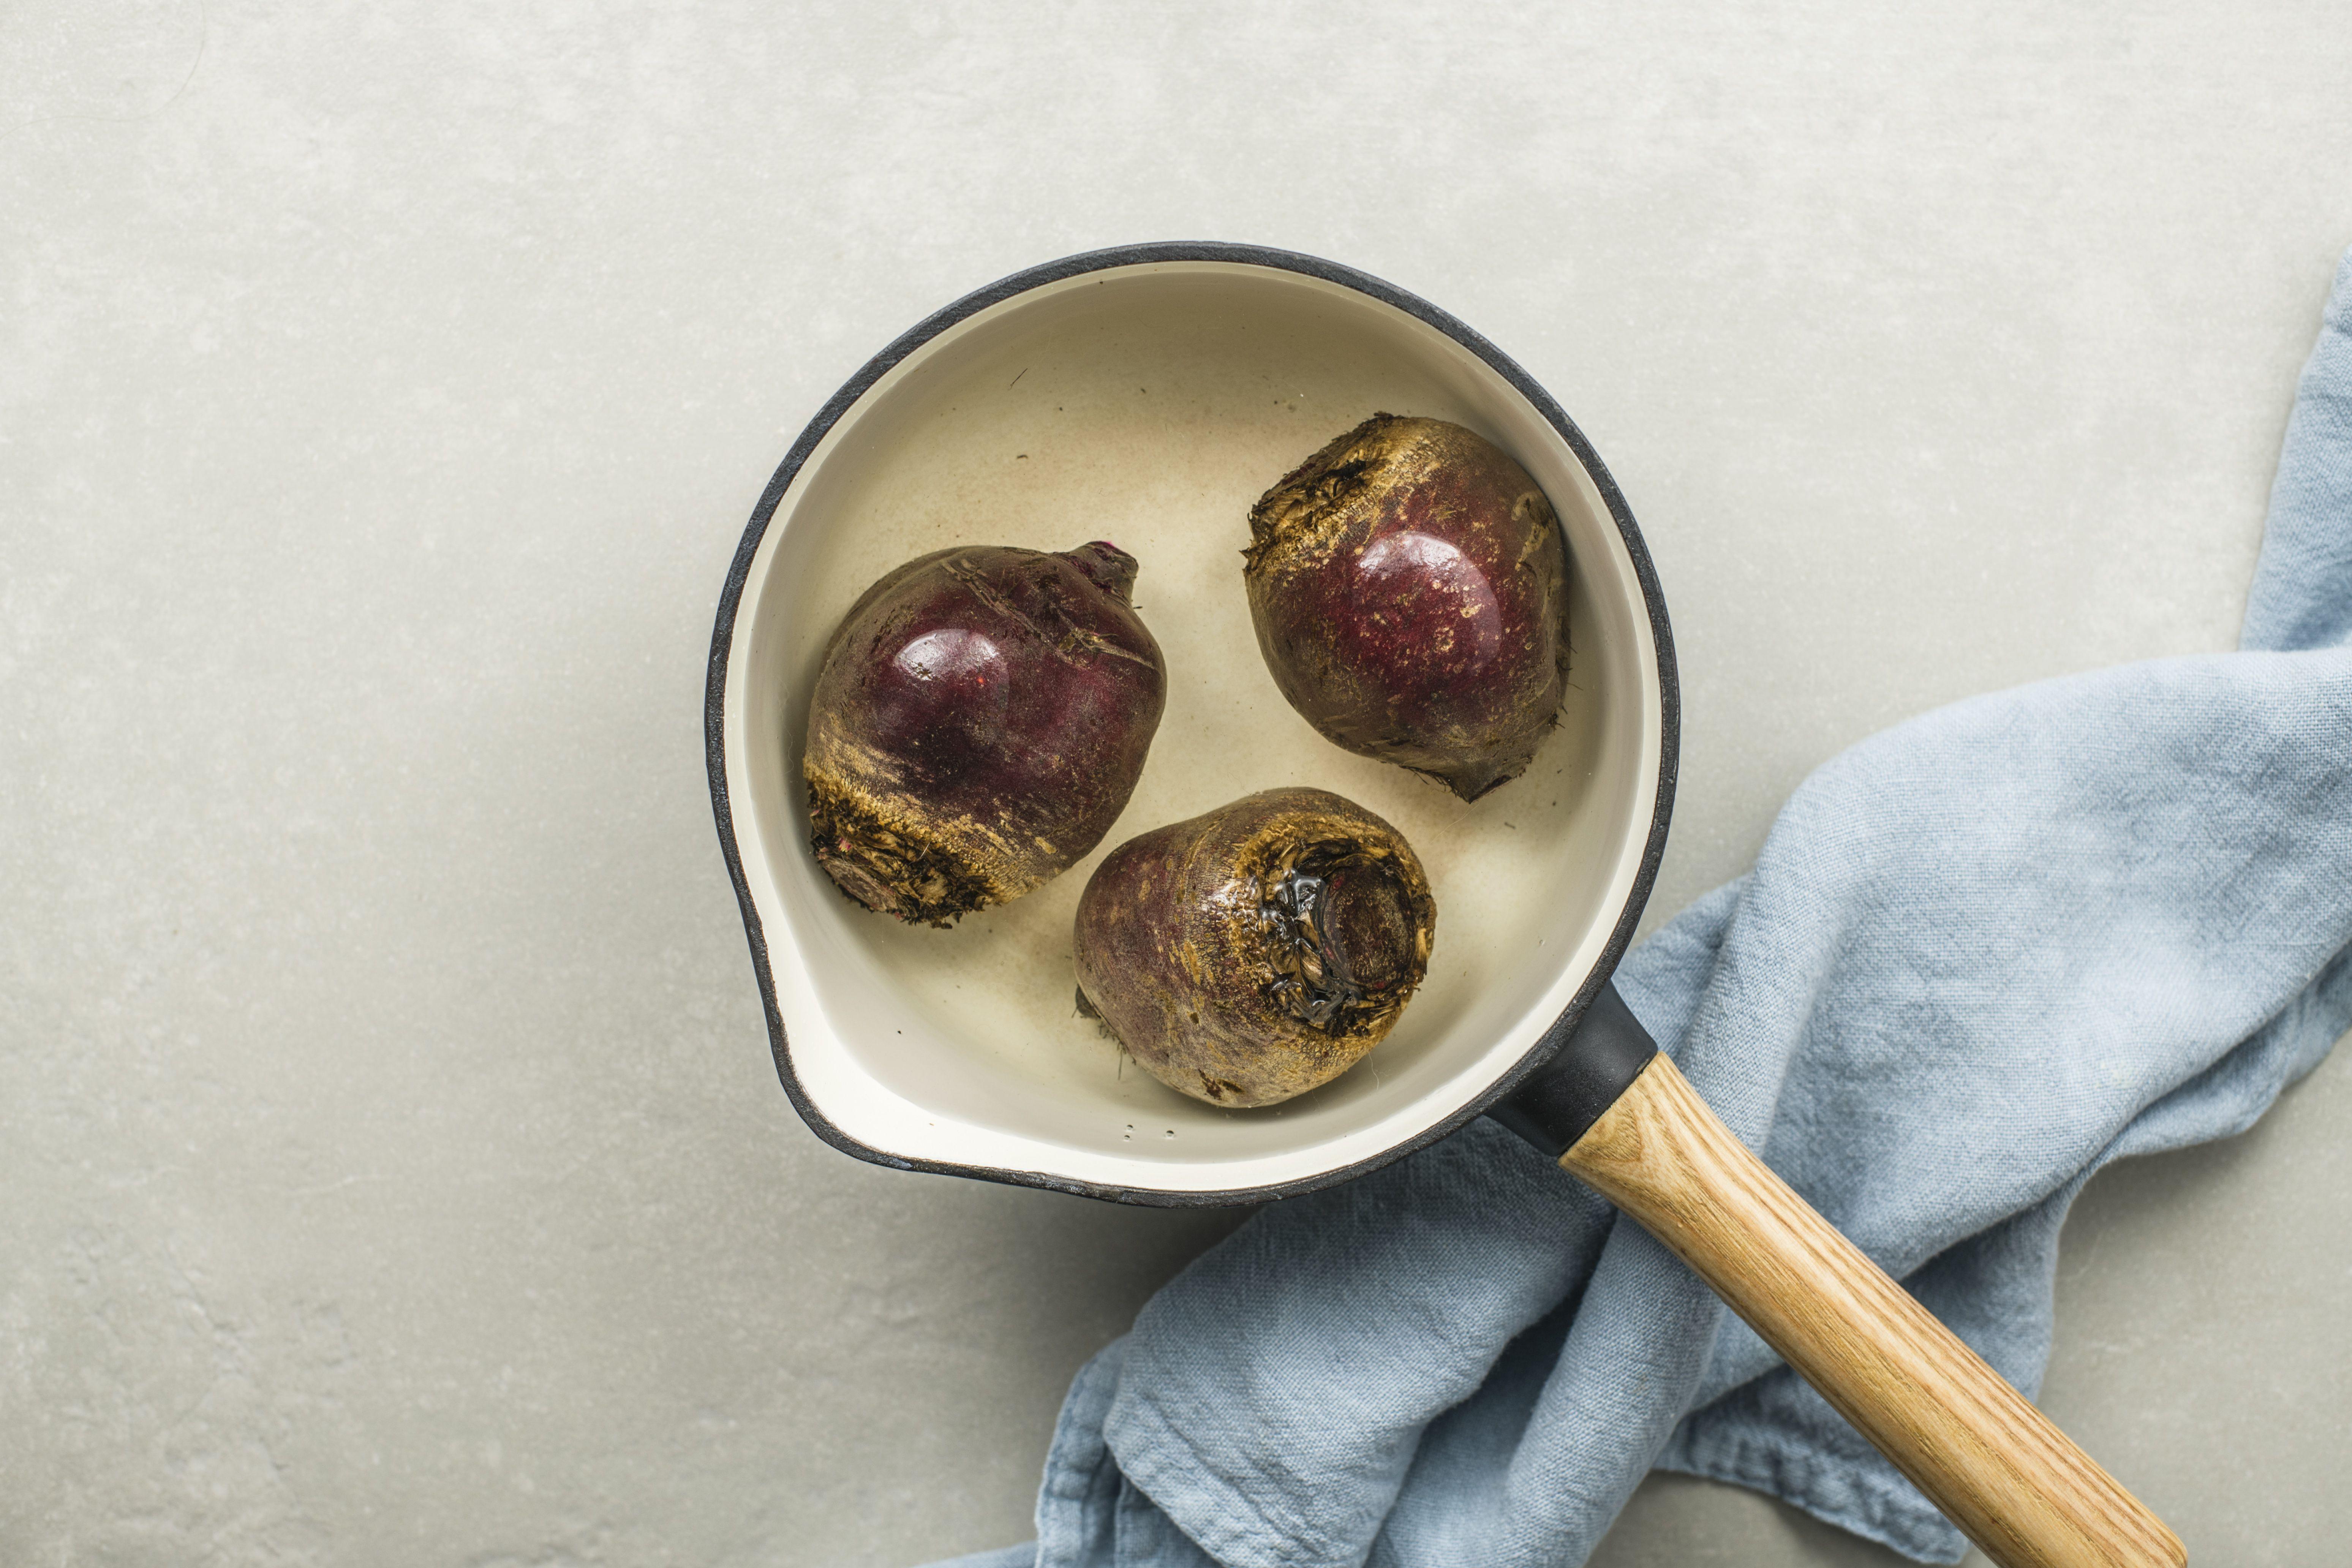 put beets into saucepan